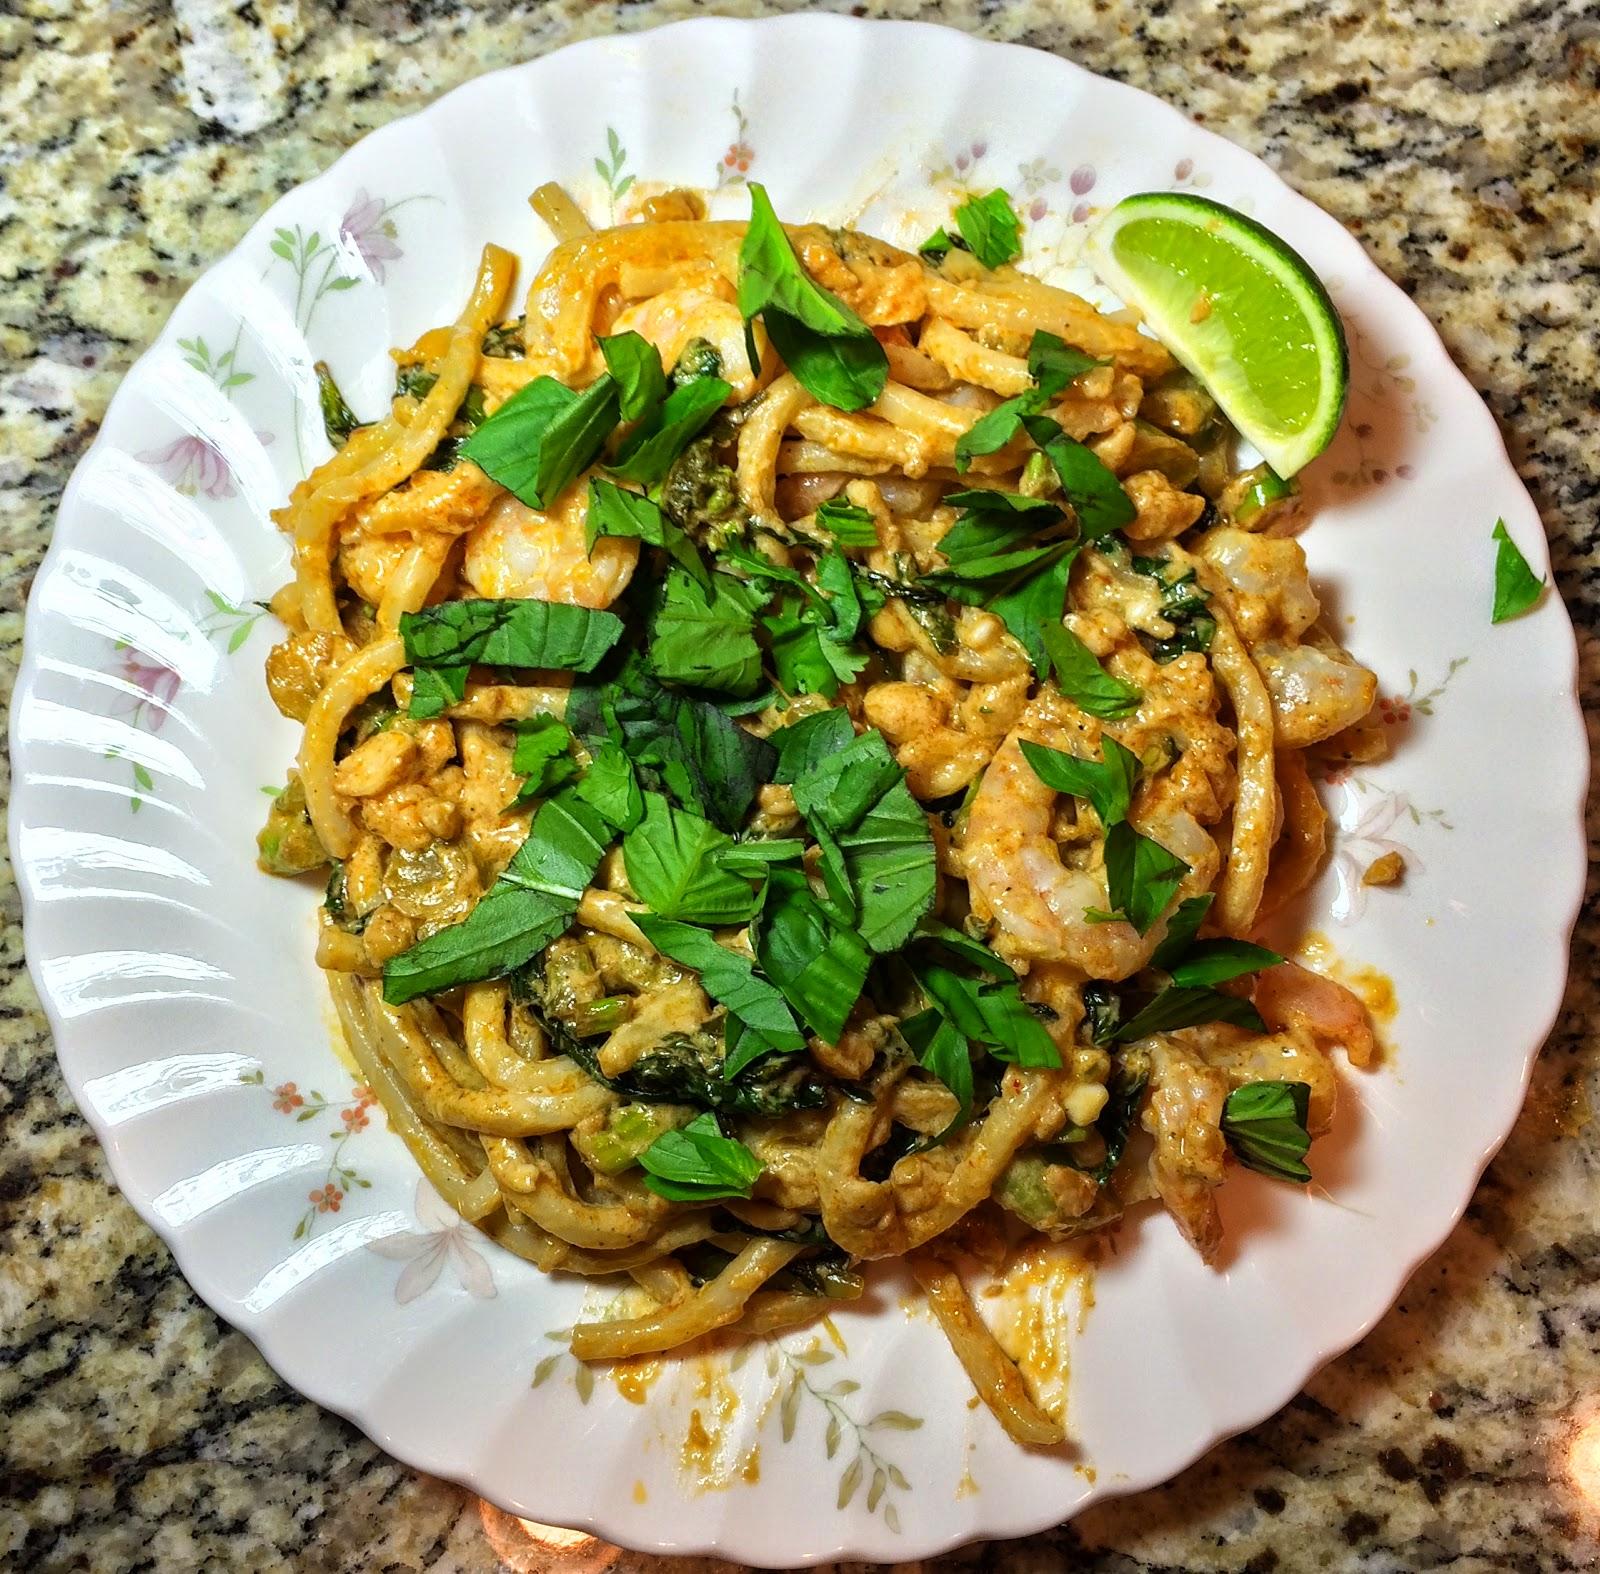 Blue apron khao soi - Ingredients For Tom Yum Style Shrimp Noodles With Gai Lan Thai Basil